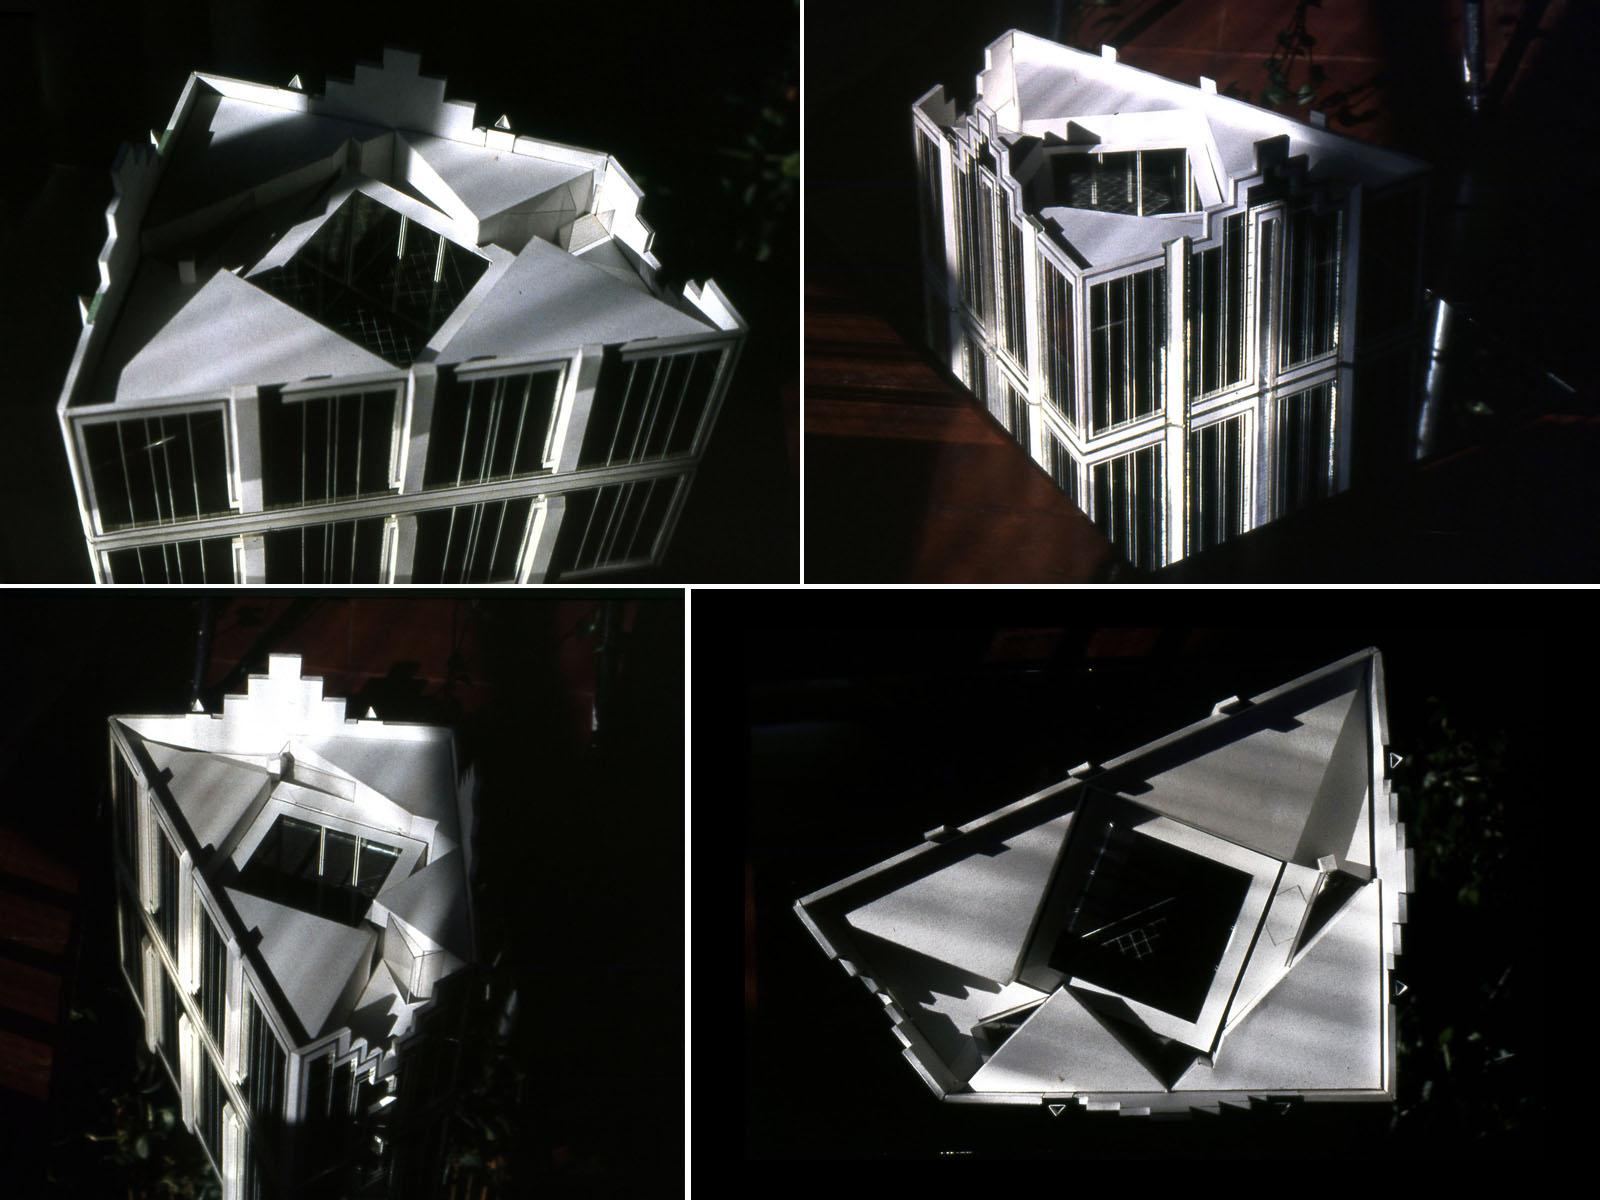 danielvillalobos-architecturexxthcentury-spanisharchitecture-schoolarchitectureproject-18